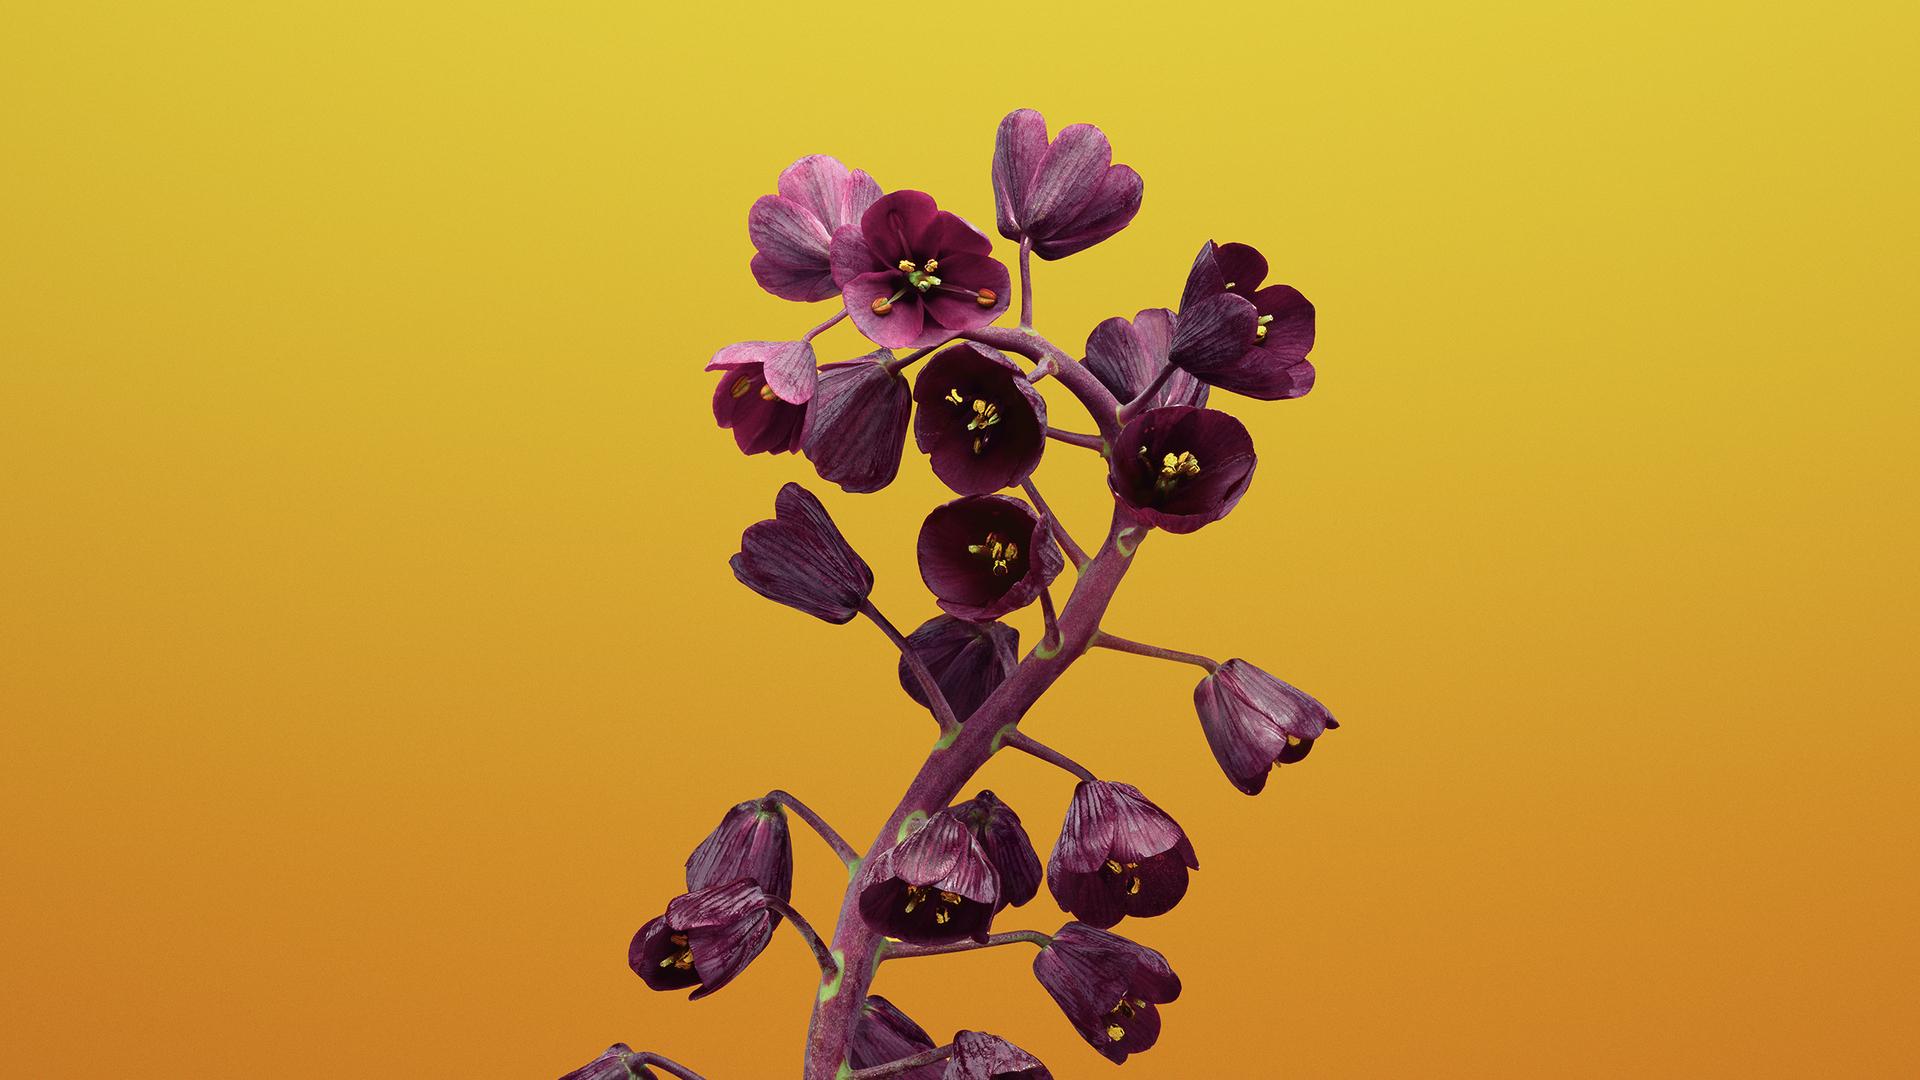 ios-11-flower-fritillaria-bb.jpg